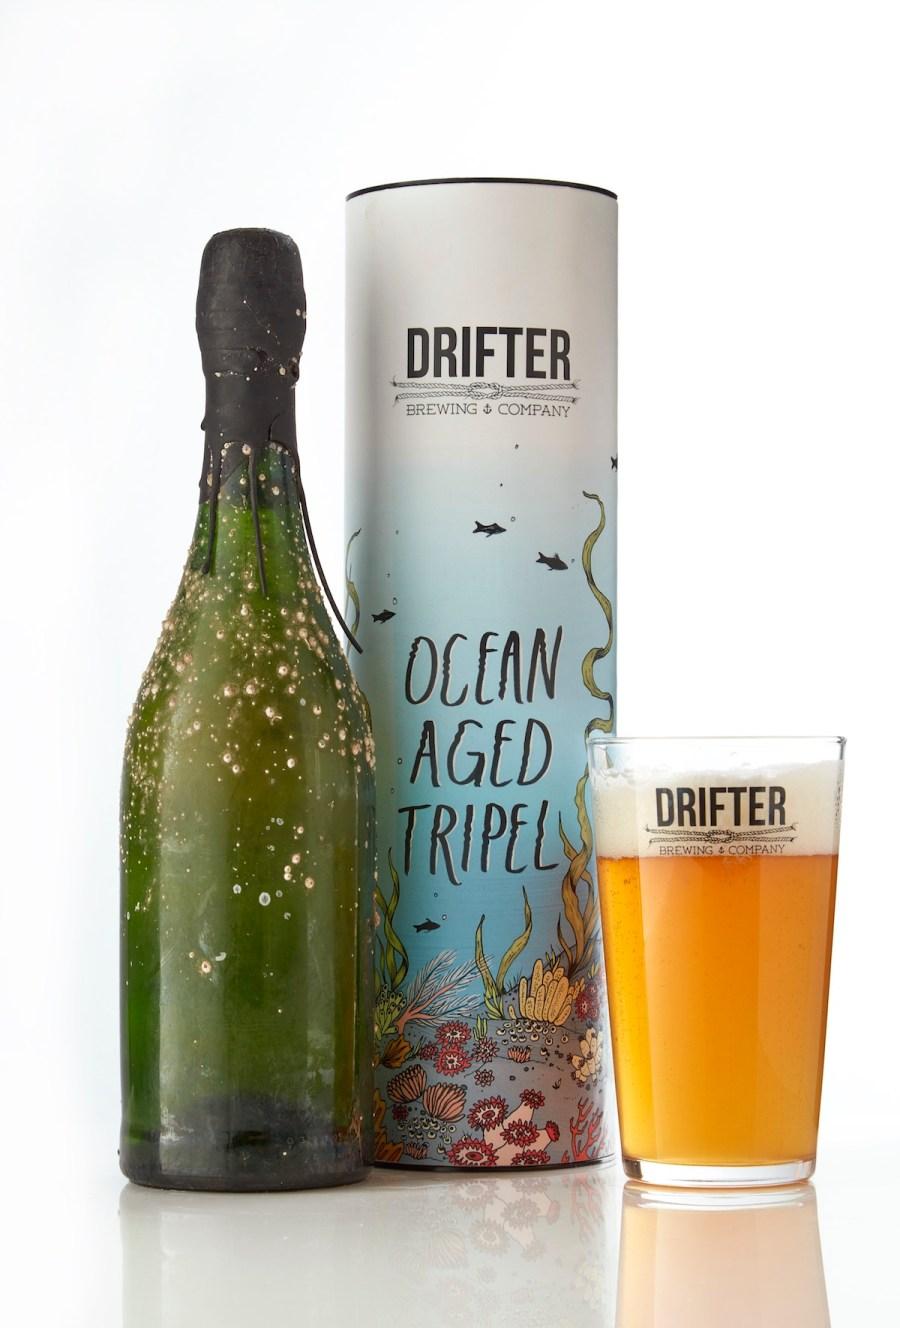 DRIFTER_OCEAN_TRIPEL_b